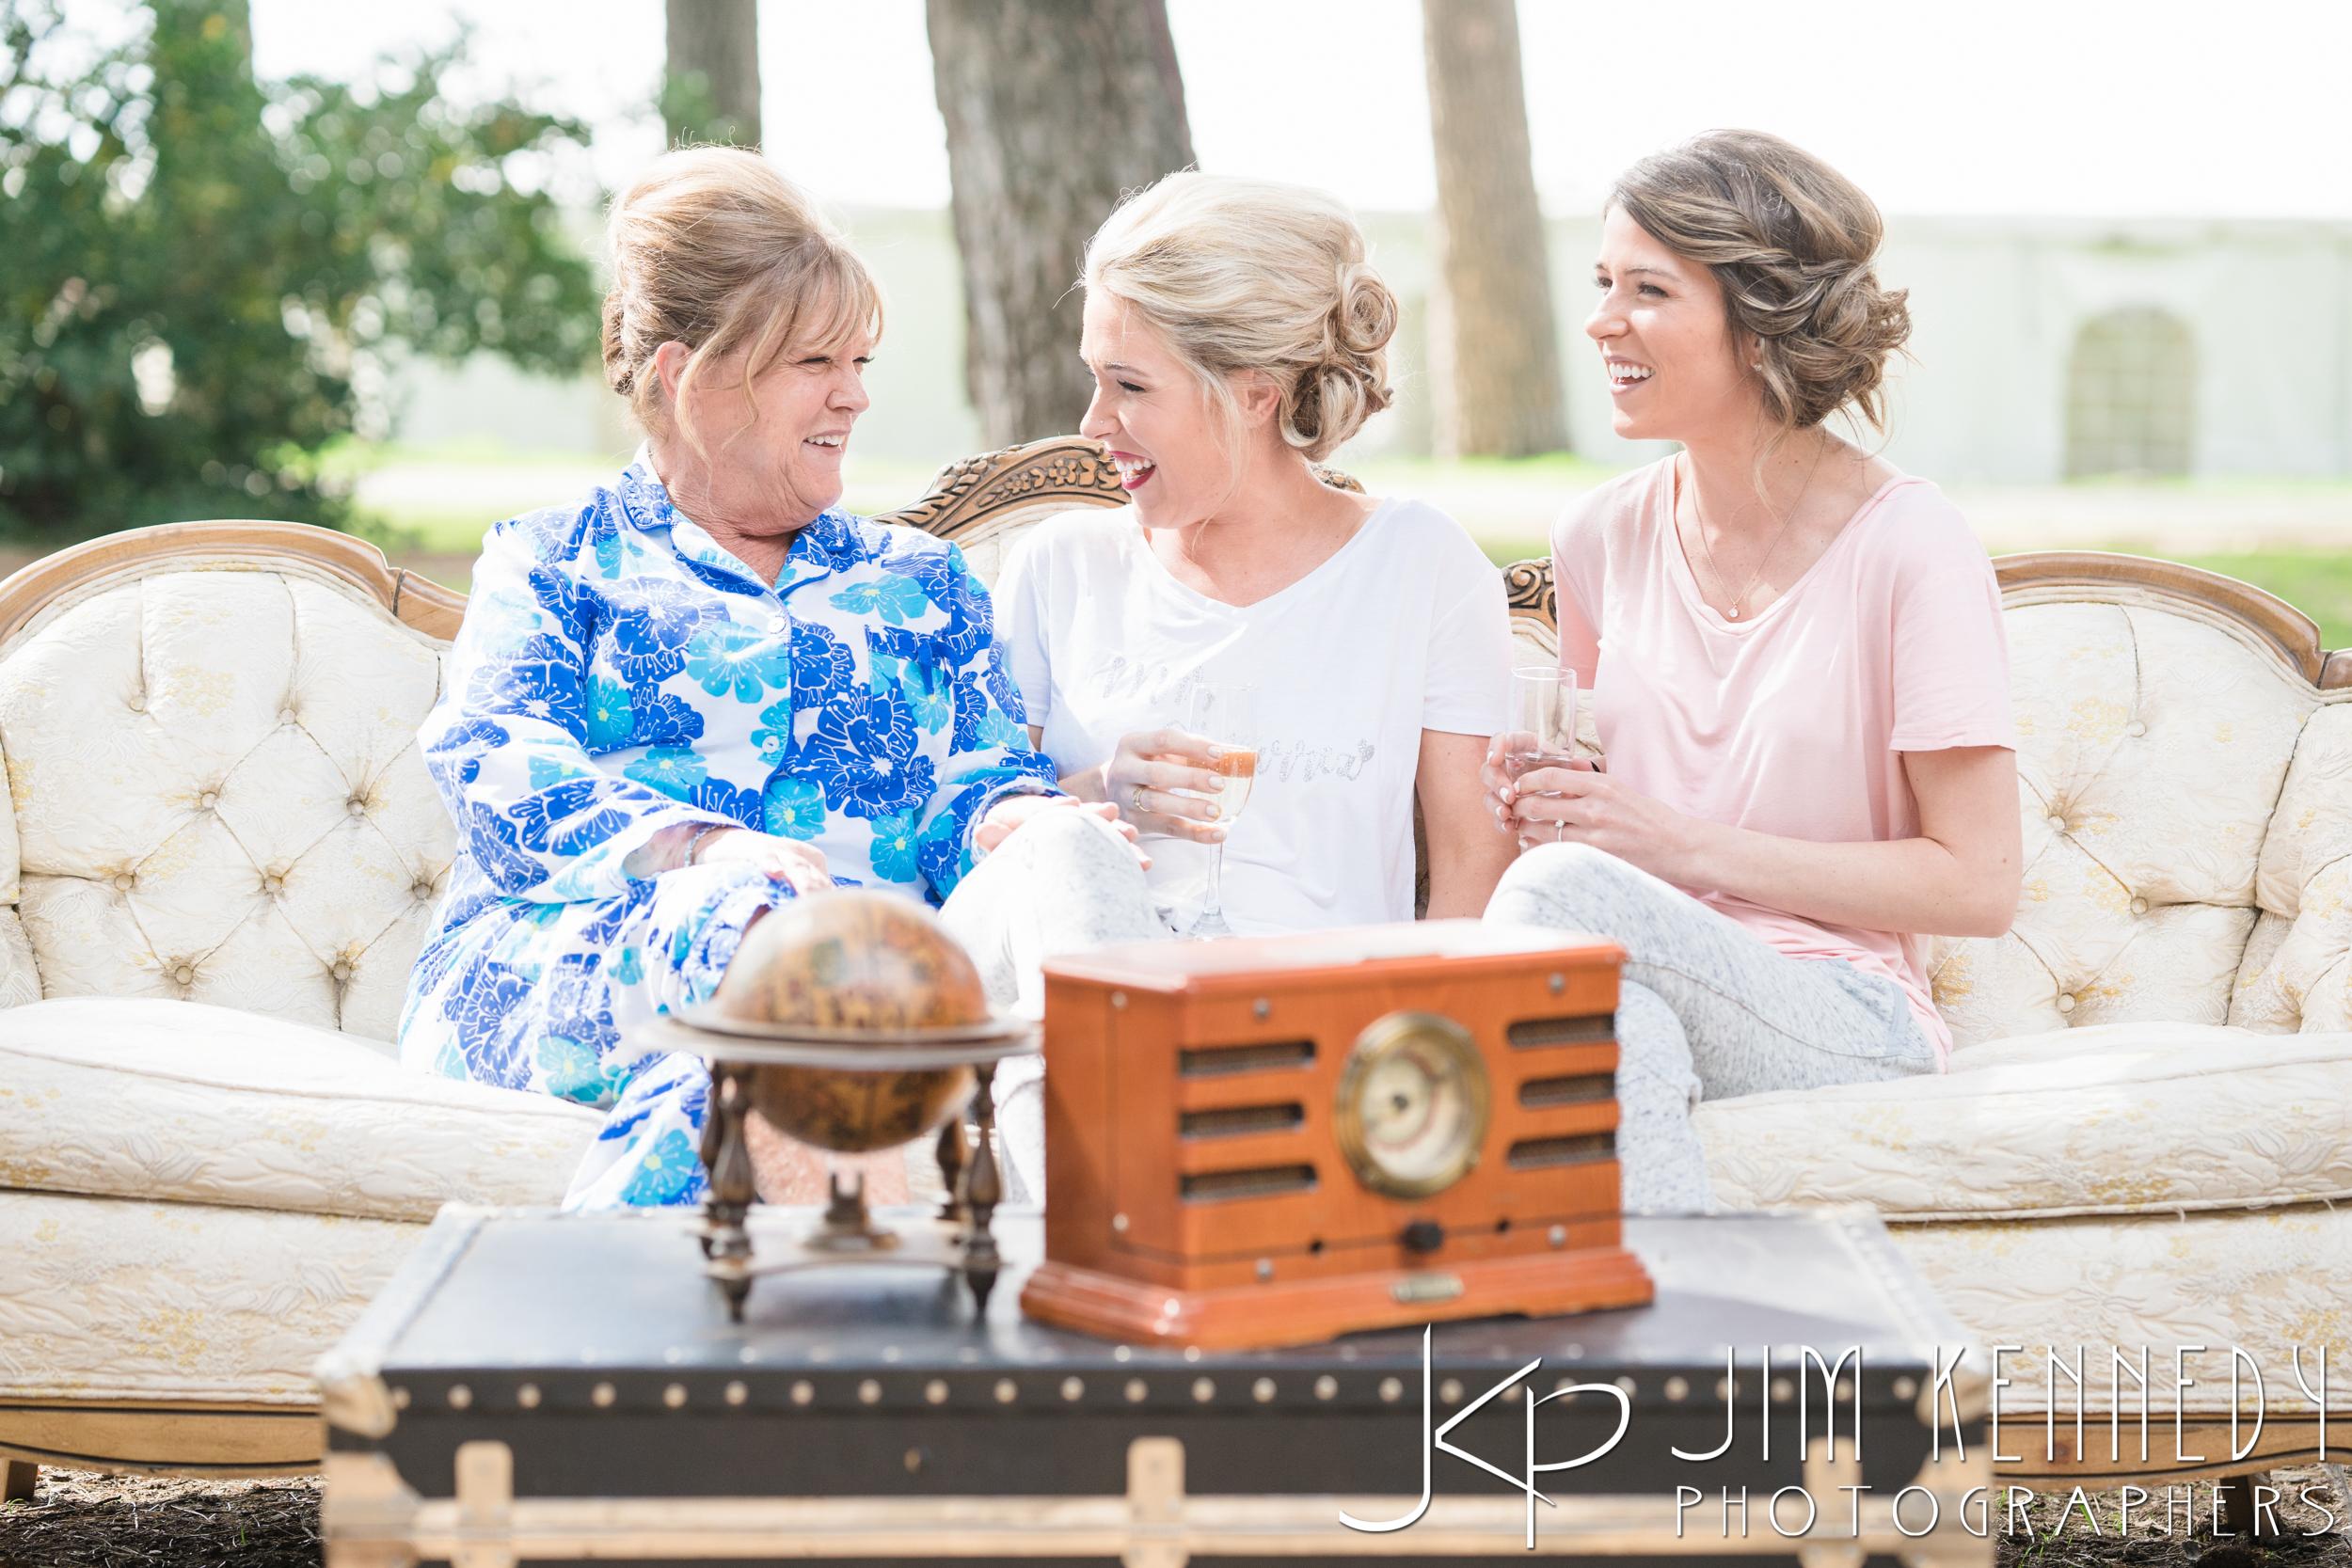 jim_kennedy_photographers_highland_springs_wedding_caitlyn_0041.jpg